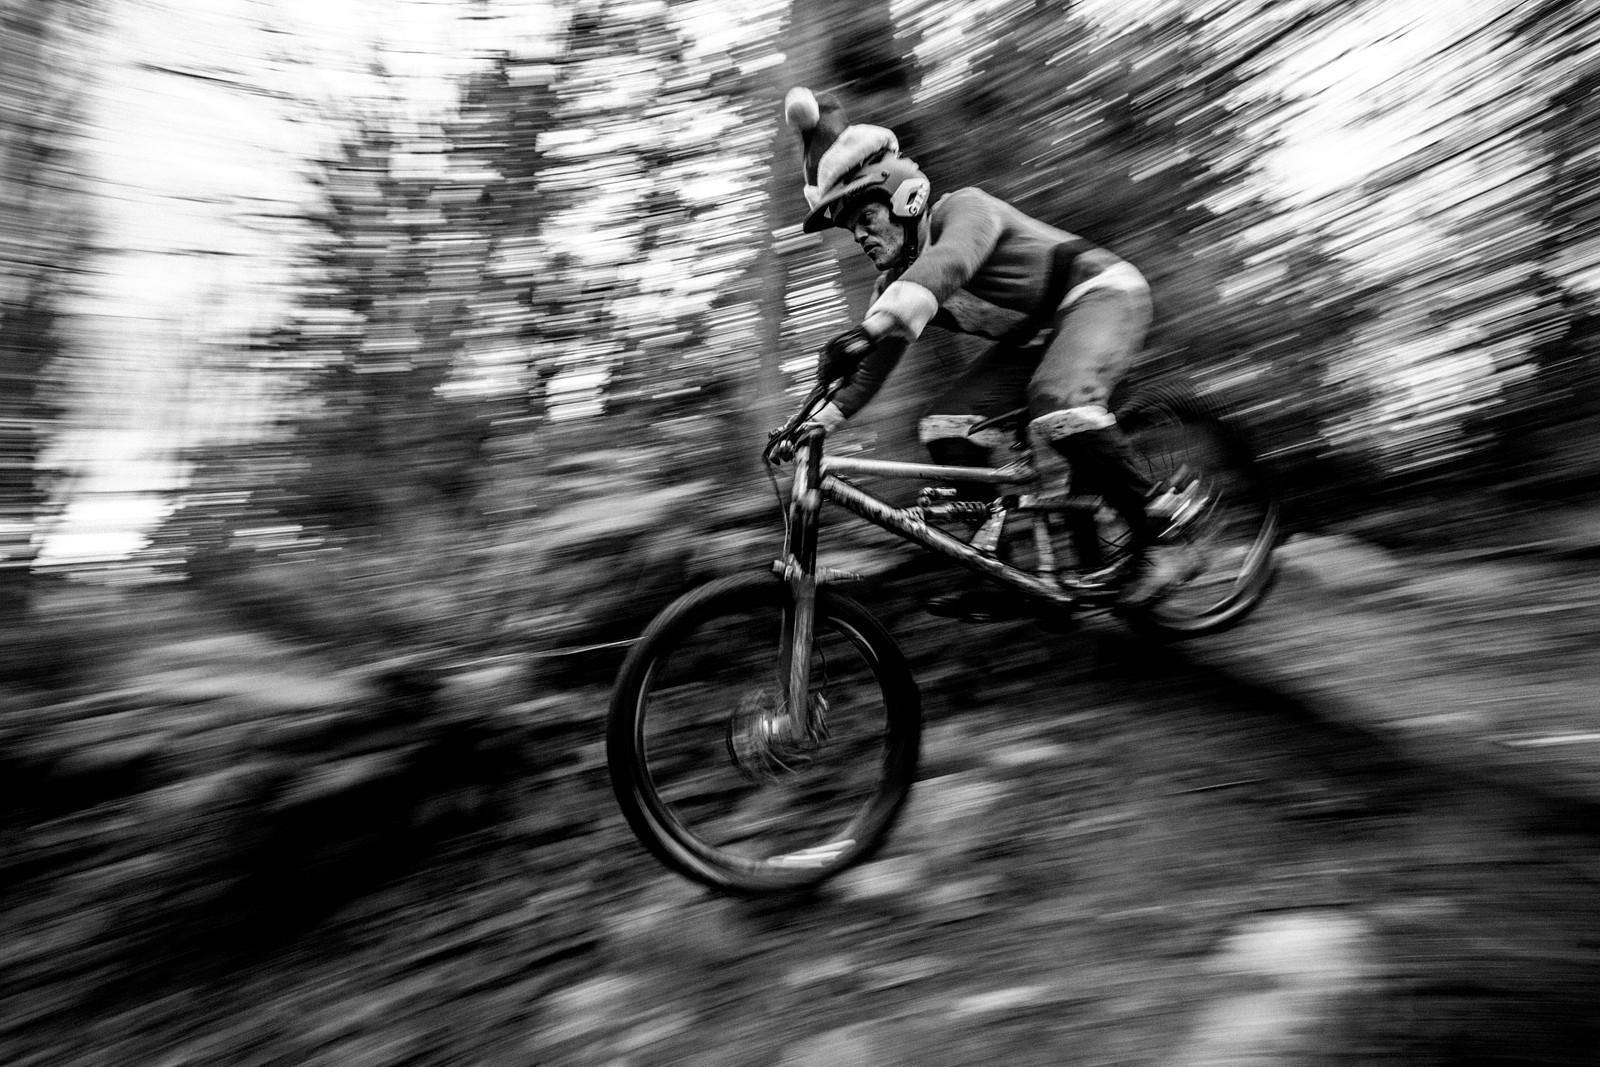 Christmas Shred - surfboard - Mountain Biking Pictures - Vital MTB